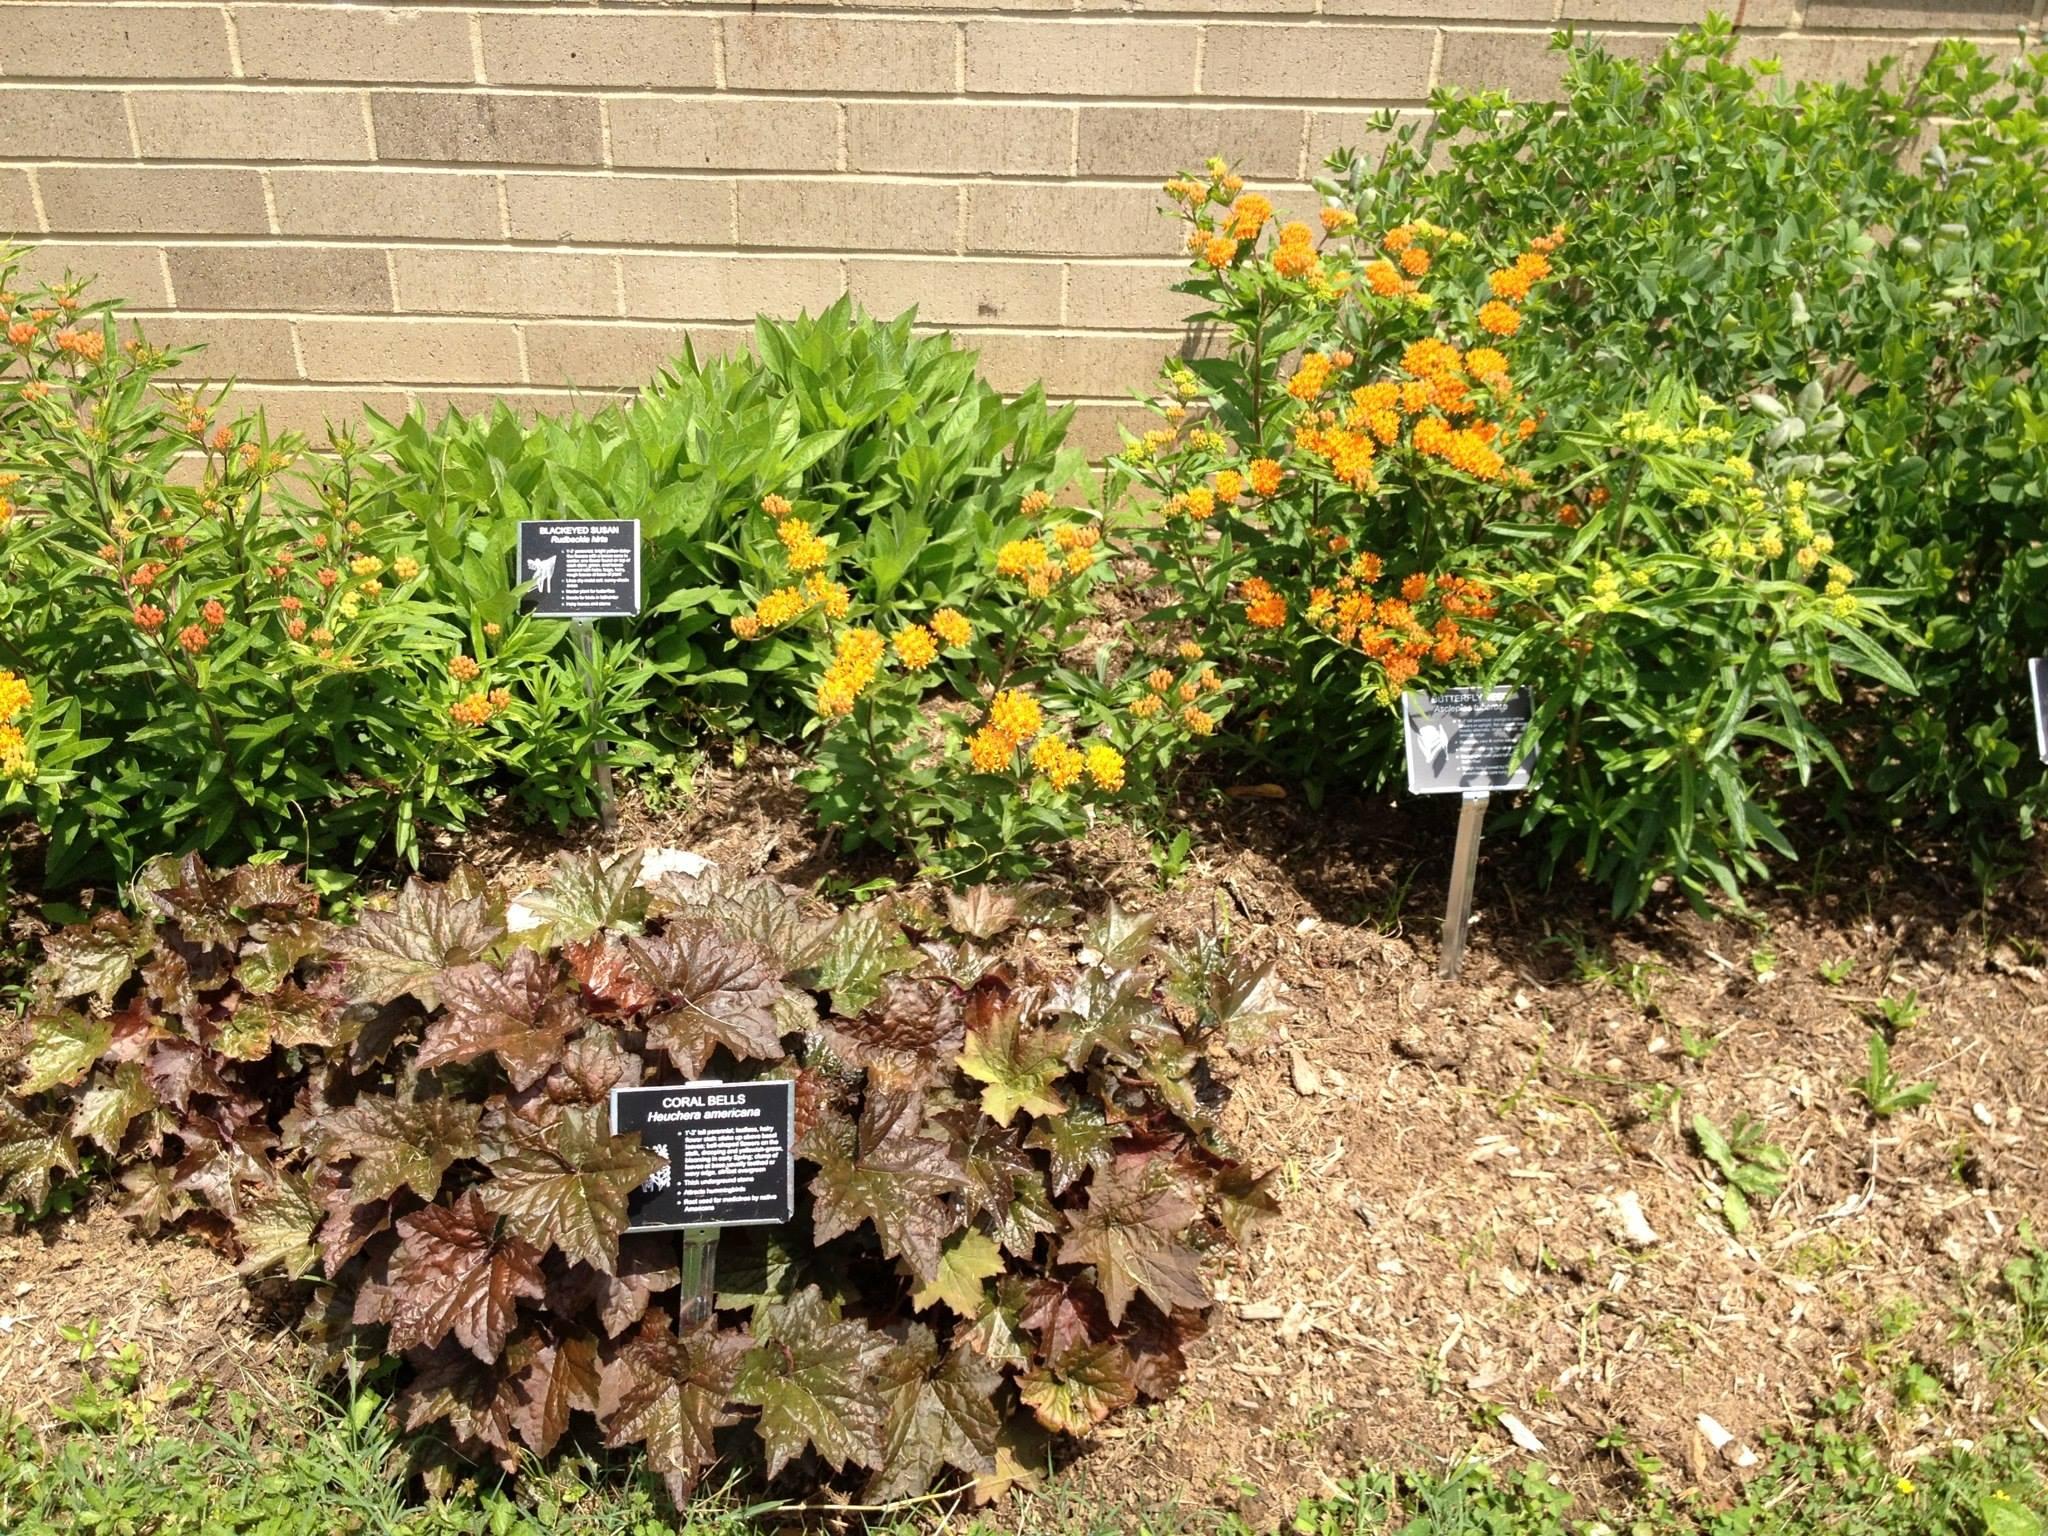 Native plant garden in Fairfax County